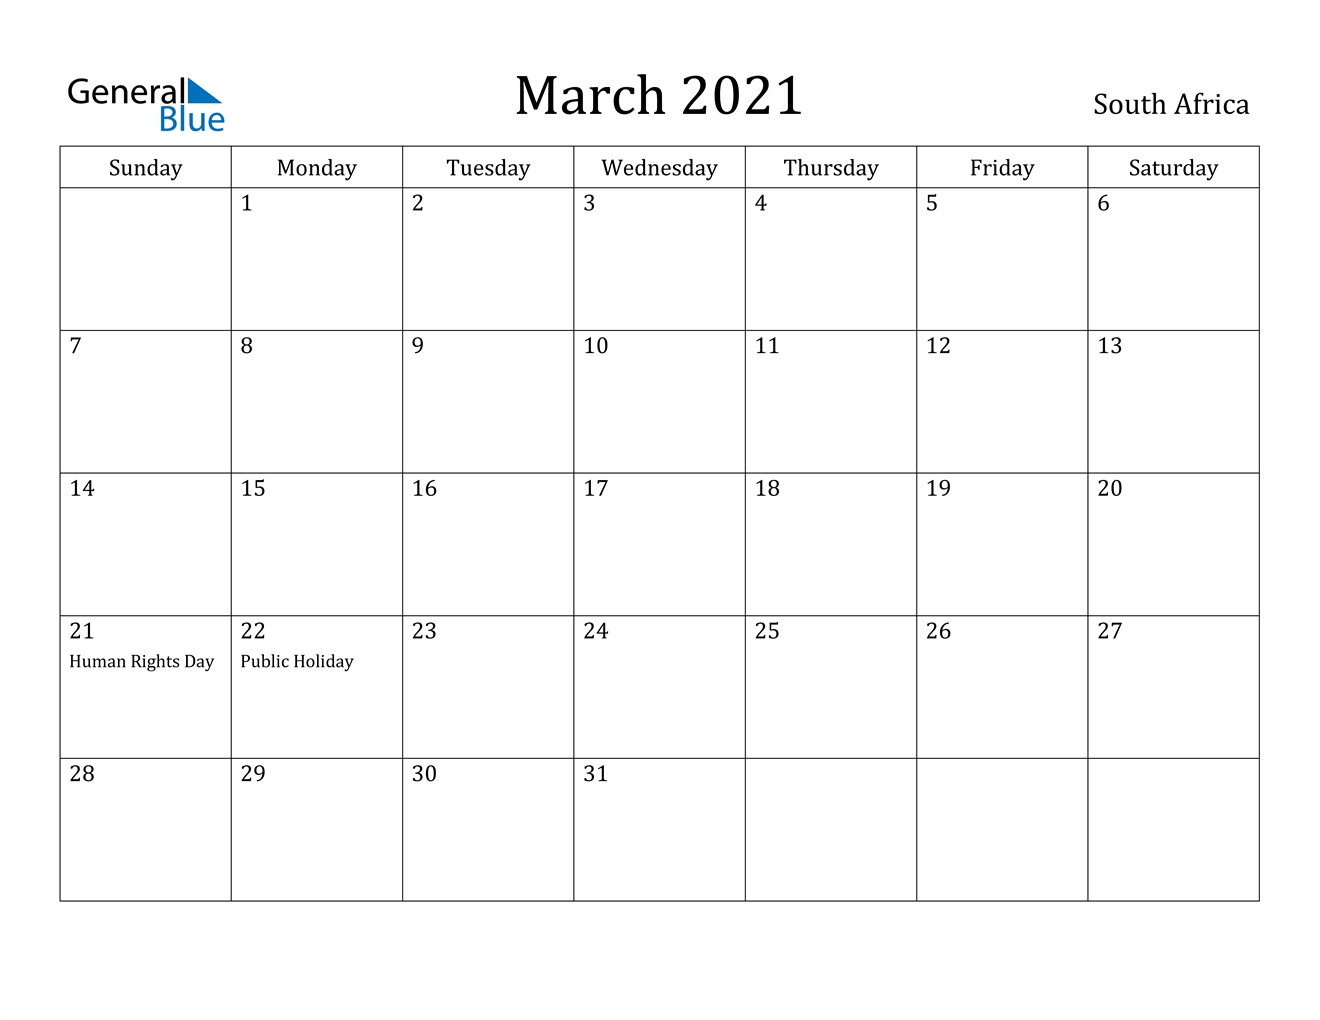 March 2021 Calendar - South Africa November 2020 - March 2021 Calendar